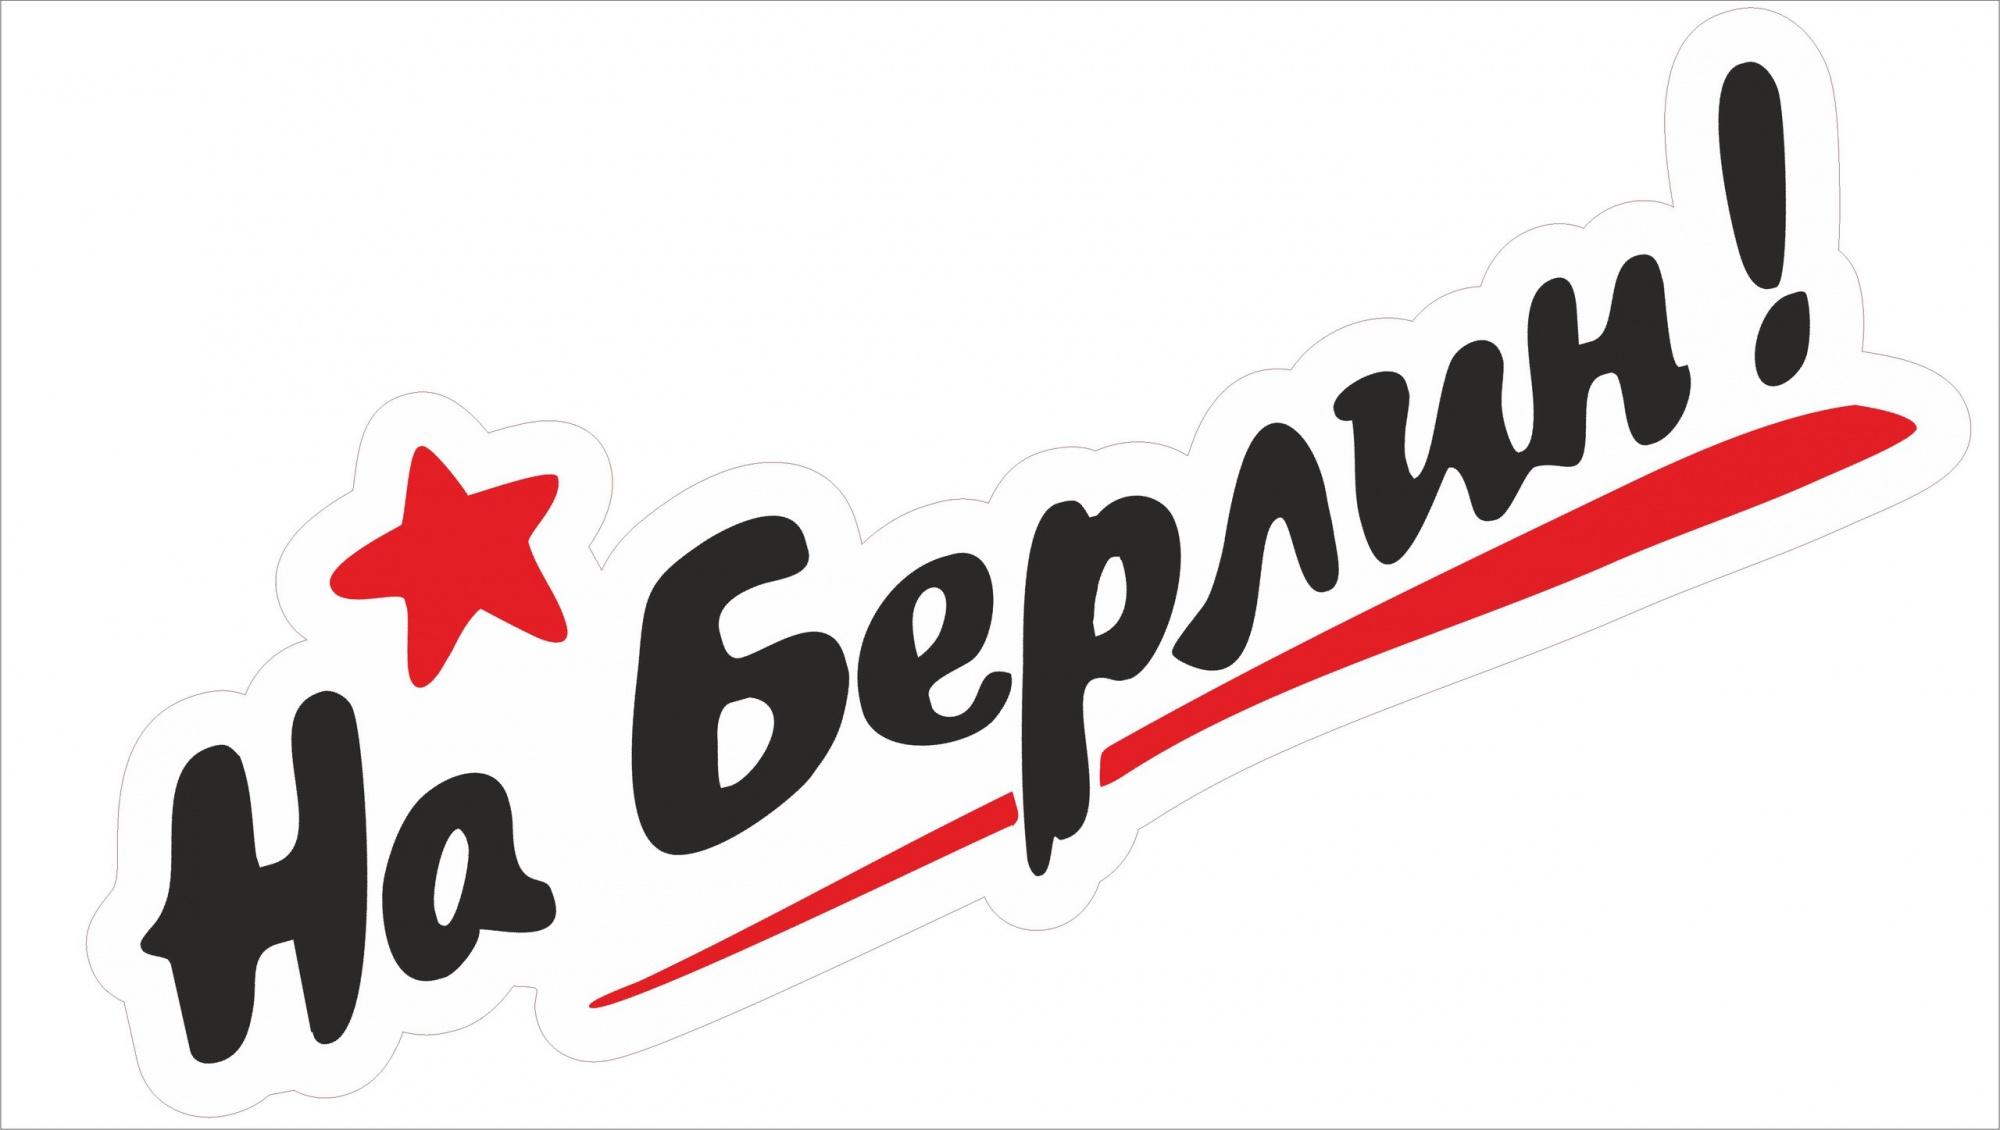 https://za-pobedu.ru/upload/iblock/4da/4da65b9396c136aa766d4c3256a74b1d.jpg